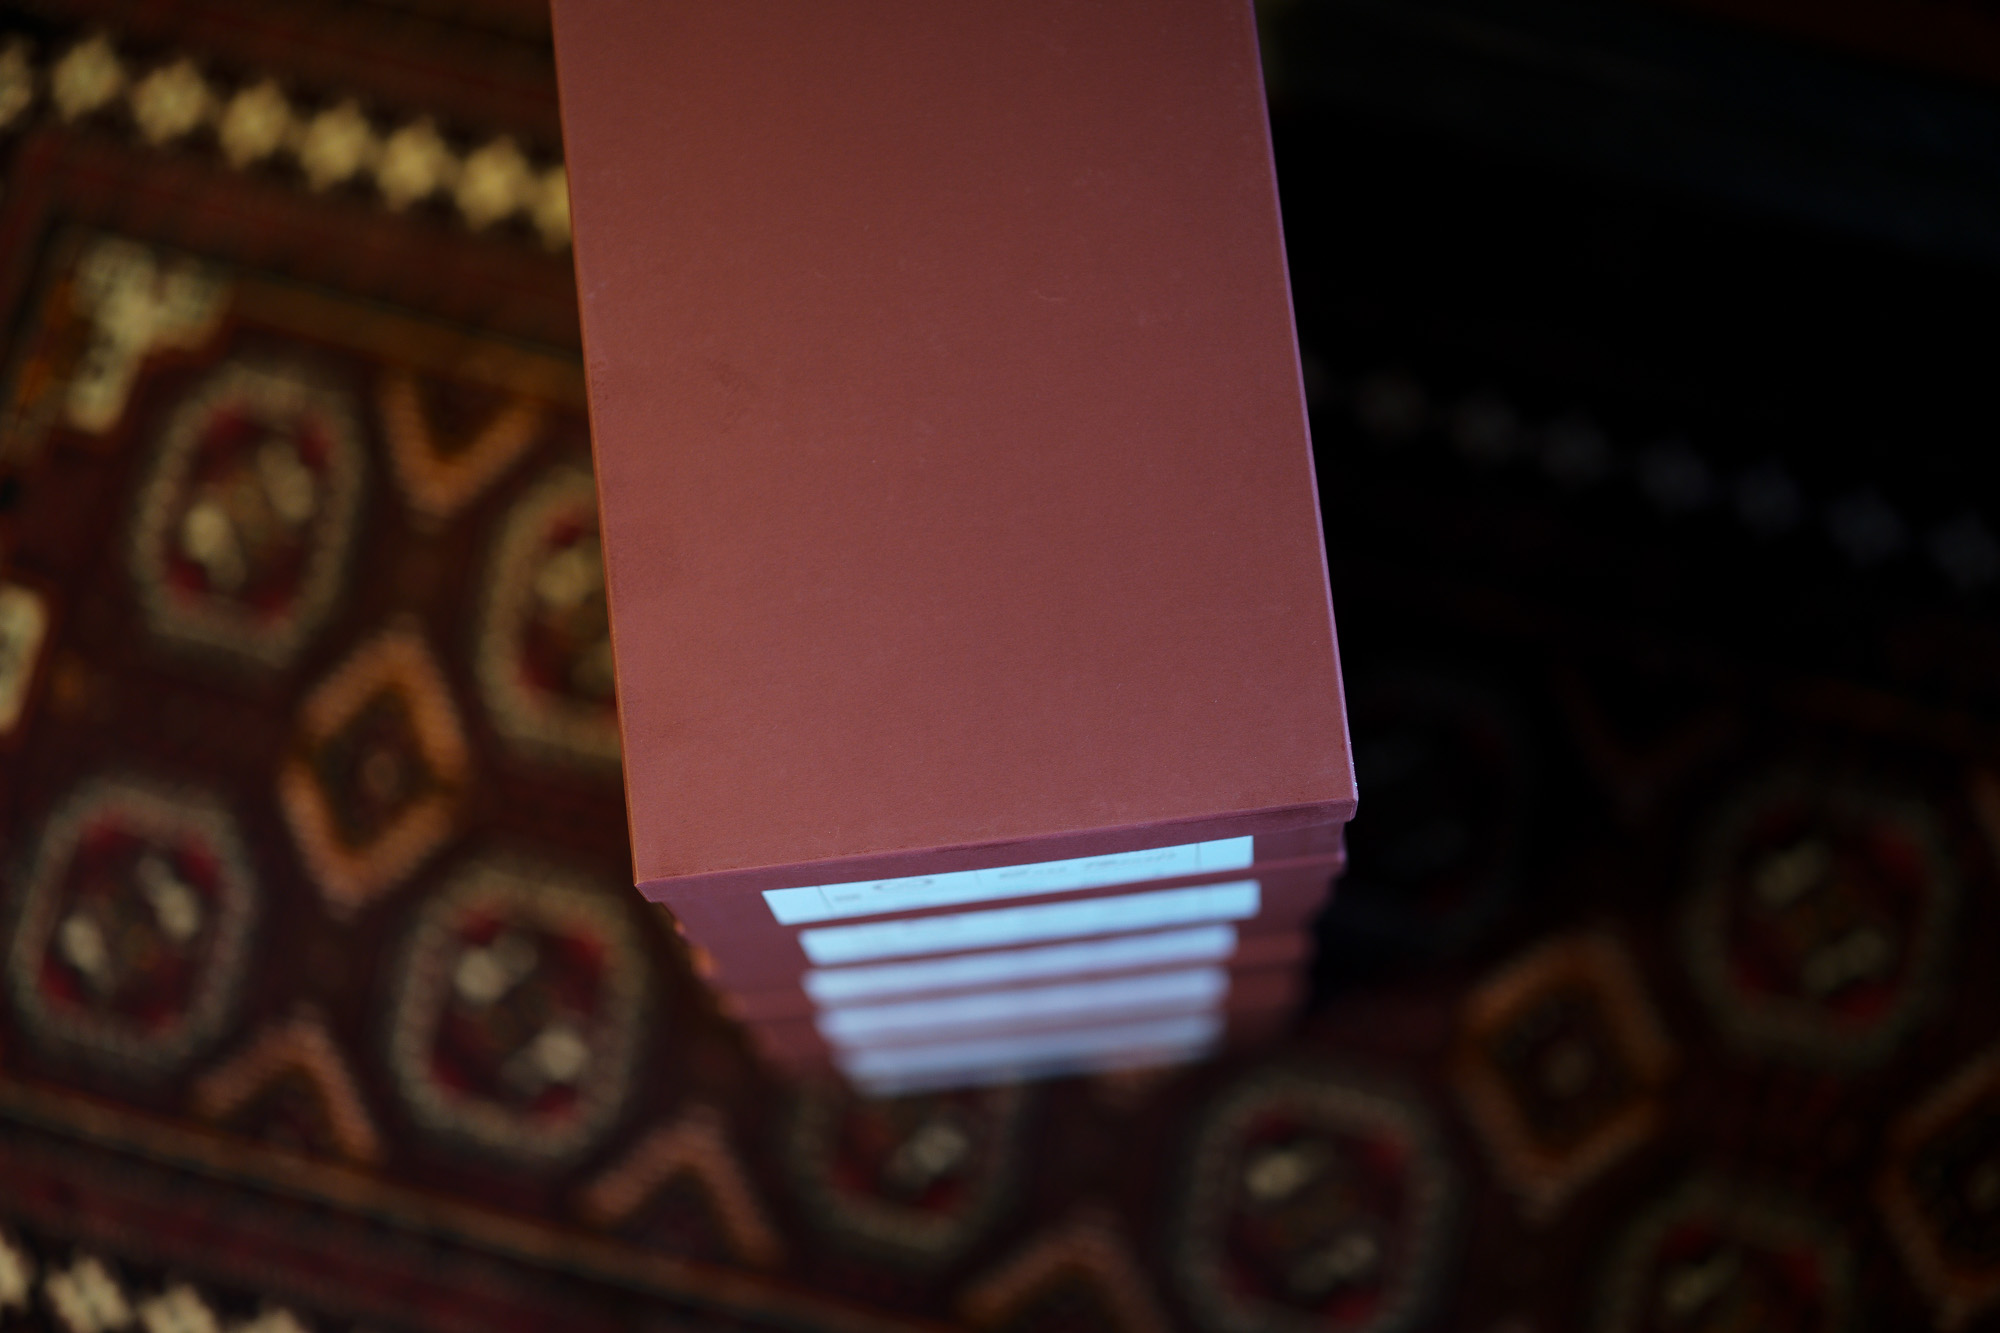 ENZO BONAFE(エンツォボナフェ) ART.3995 Double strap boot Du Puy Vitello デュプイ社ボックスカーフ ダブルストラップブーツ NERO (ブラック) made in italy (イタリア製) 2019 春夏新作  enzobonafe 愛知 名古屋 Alto e Diritto アルト エ デリット alto e diritto アルトエデリット 5,5.5,6,6.5,7,7.5,8,8.5,9,9.5